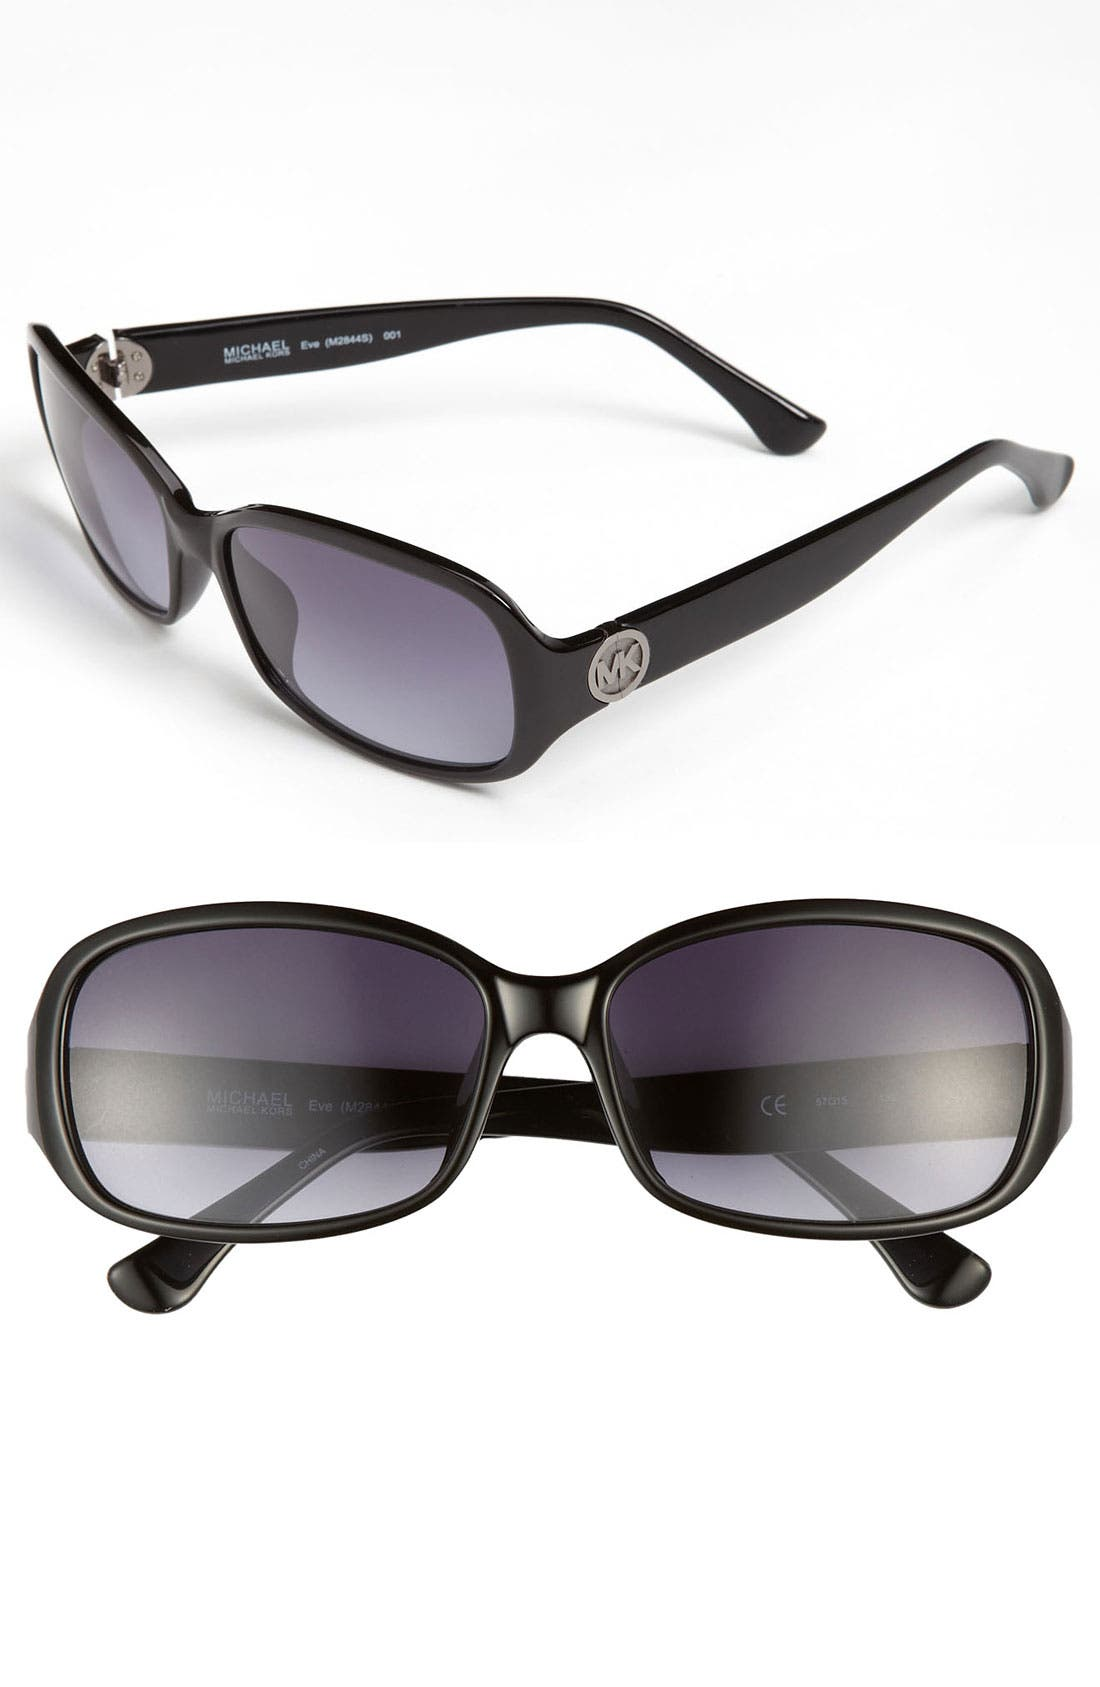 Alternate Image 1 Selected - MICHAEL Michael Kors 'Basic' 57mm Sunglasses